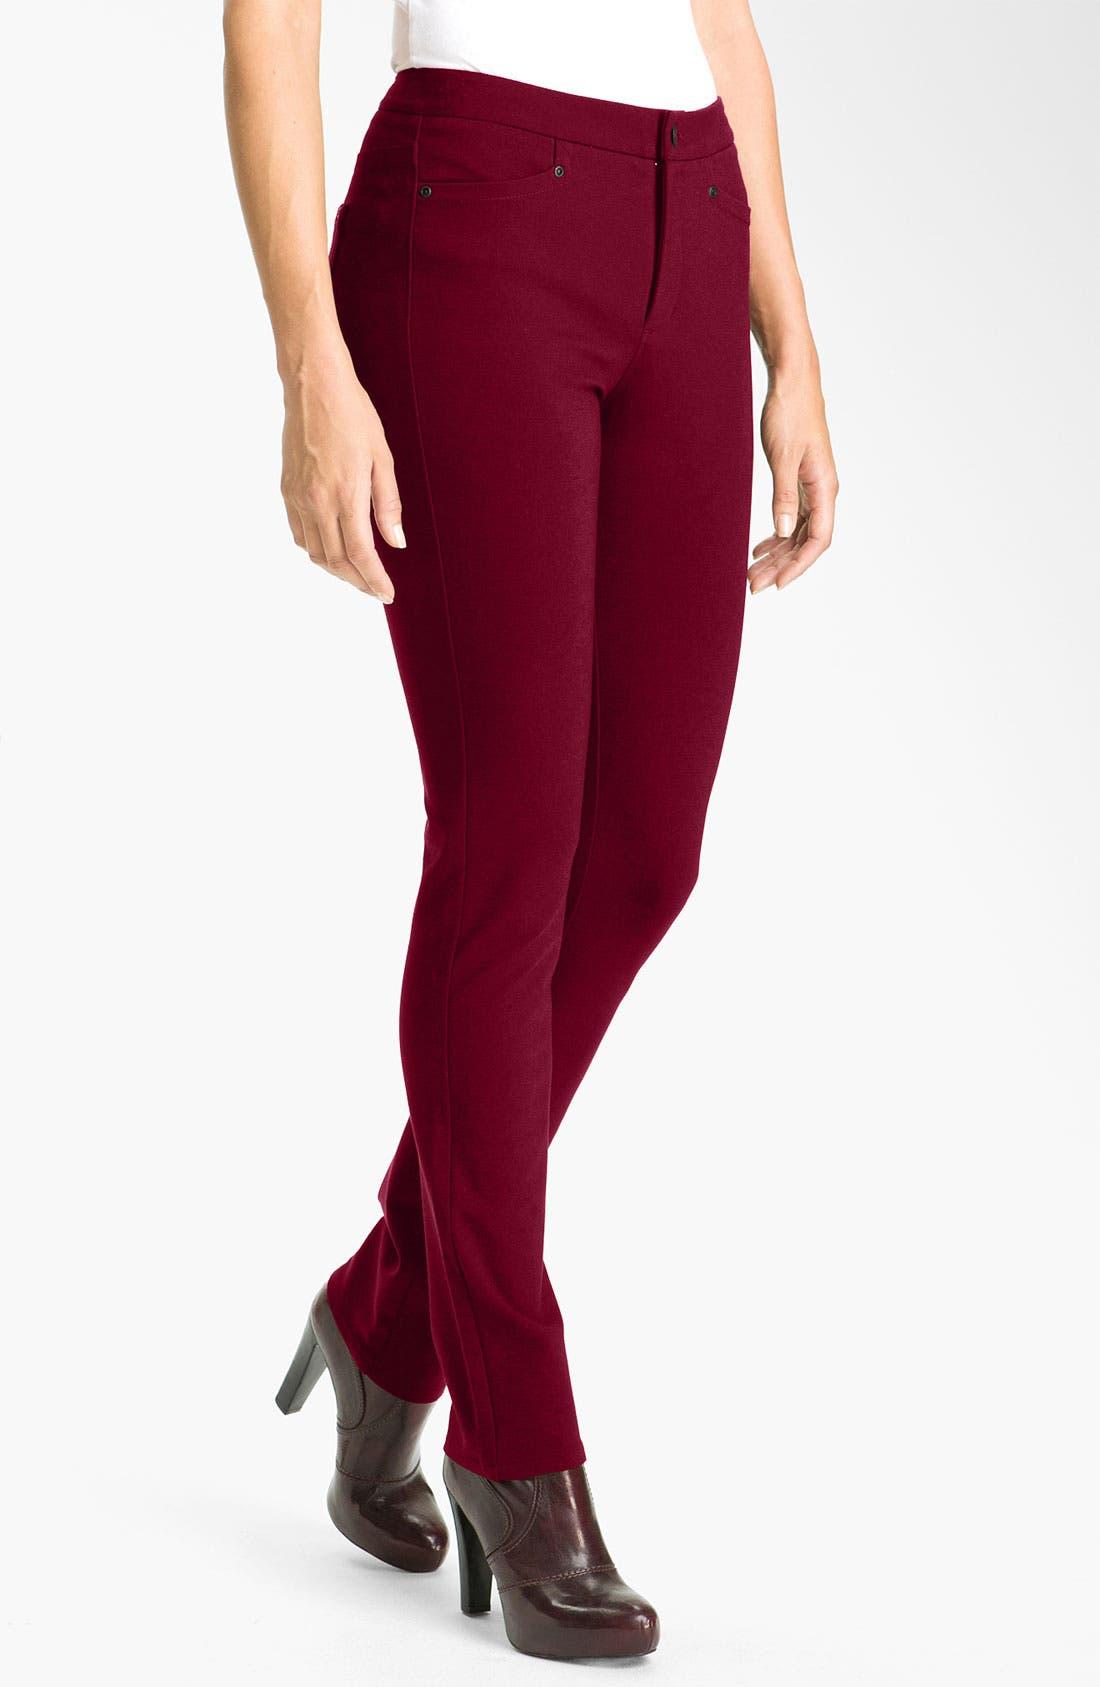 'Samantha' Stretch Ponte Knit Pants,                             Main thumbnail 1, color,                             Plumberry